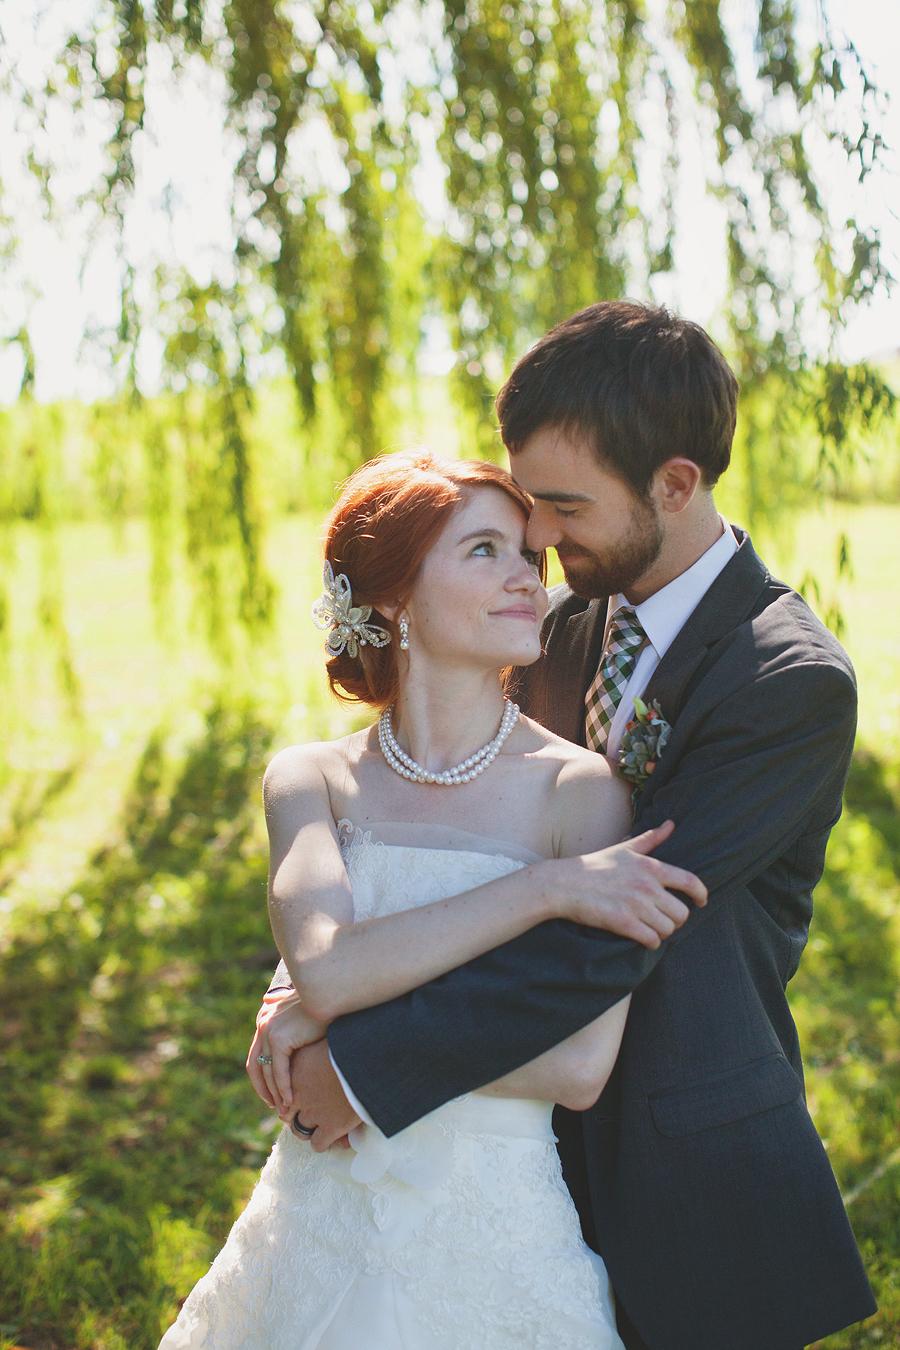 Toledo_Cleveland_Ohio_Wedding_Portrait_Photographer-34.jpg